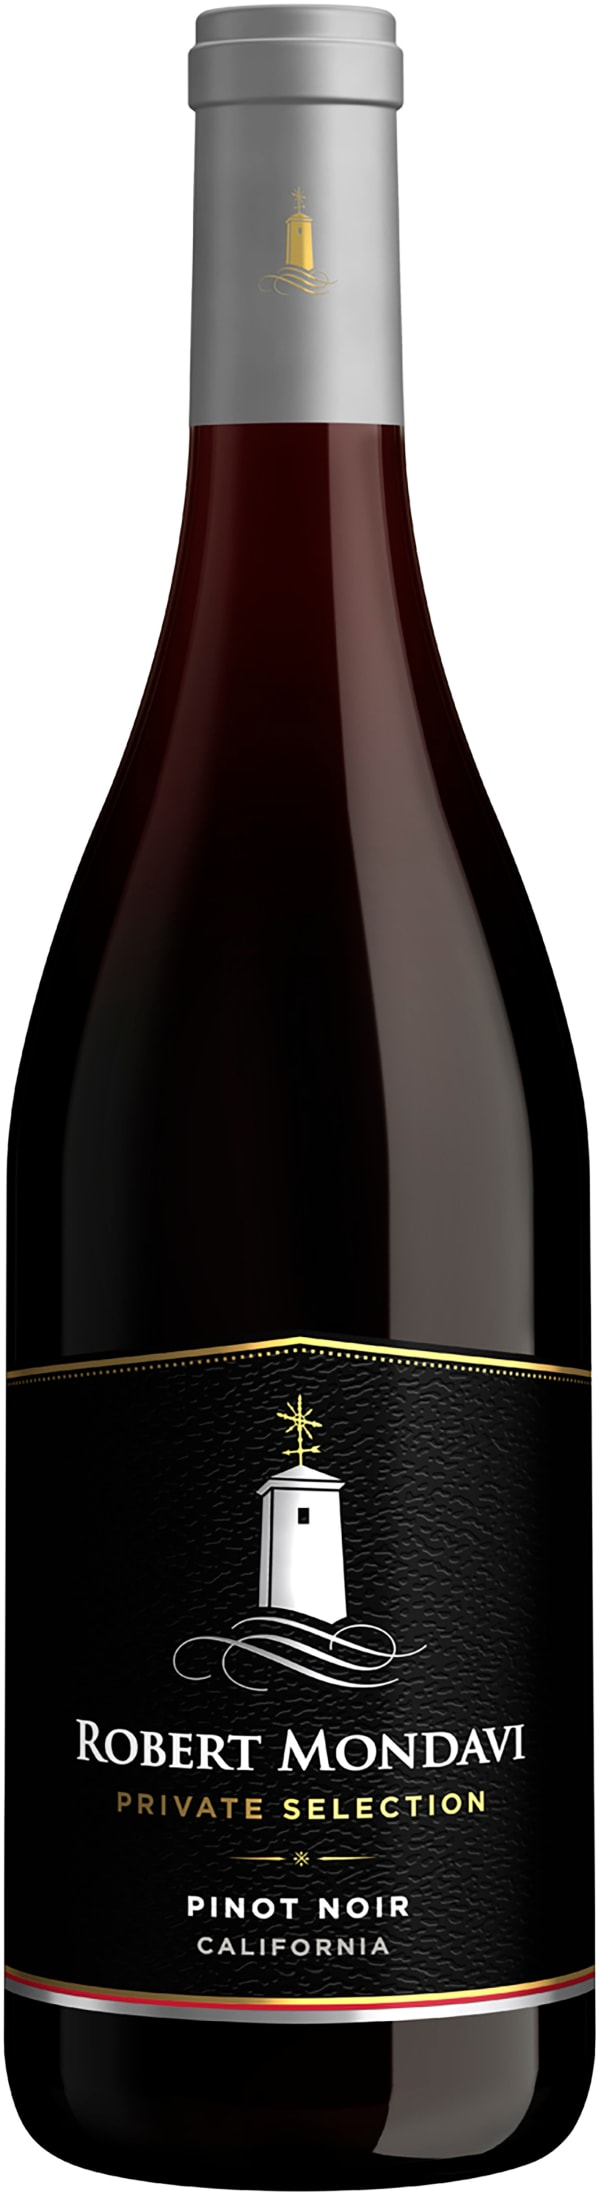 Robert Mondavi Private Selection Pinot Noir 2018